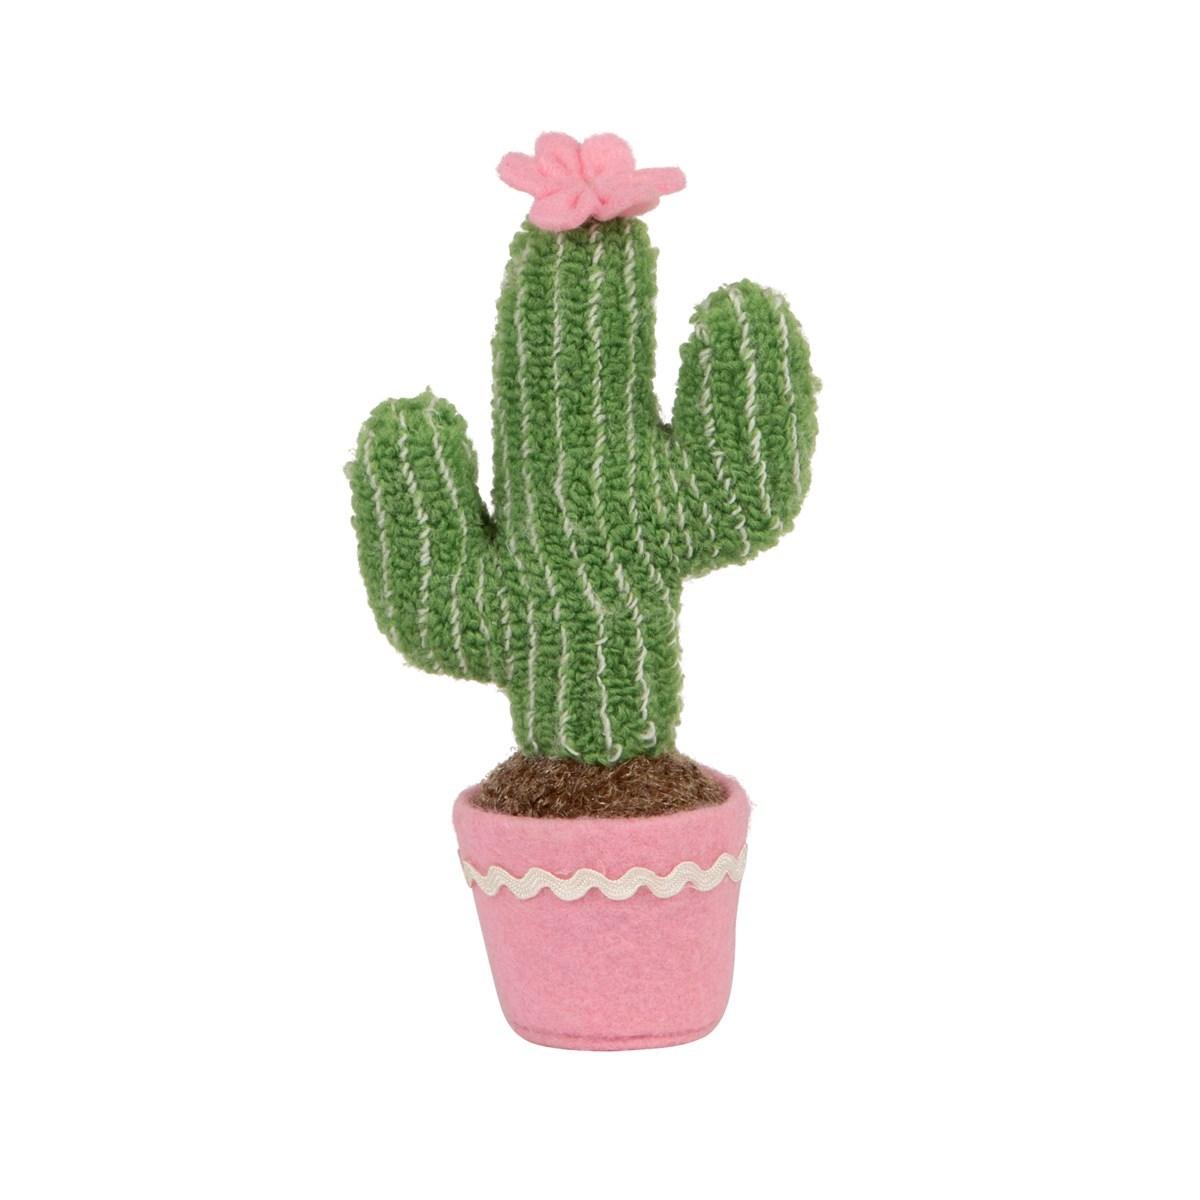 mini pastel cactus fabric decoration. Black Bedroom Furniture Sets. Home Design Ideas